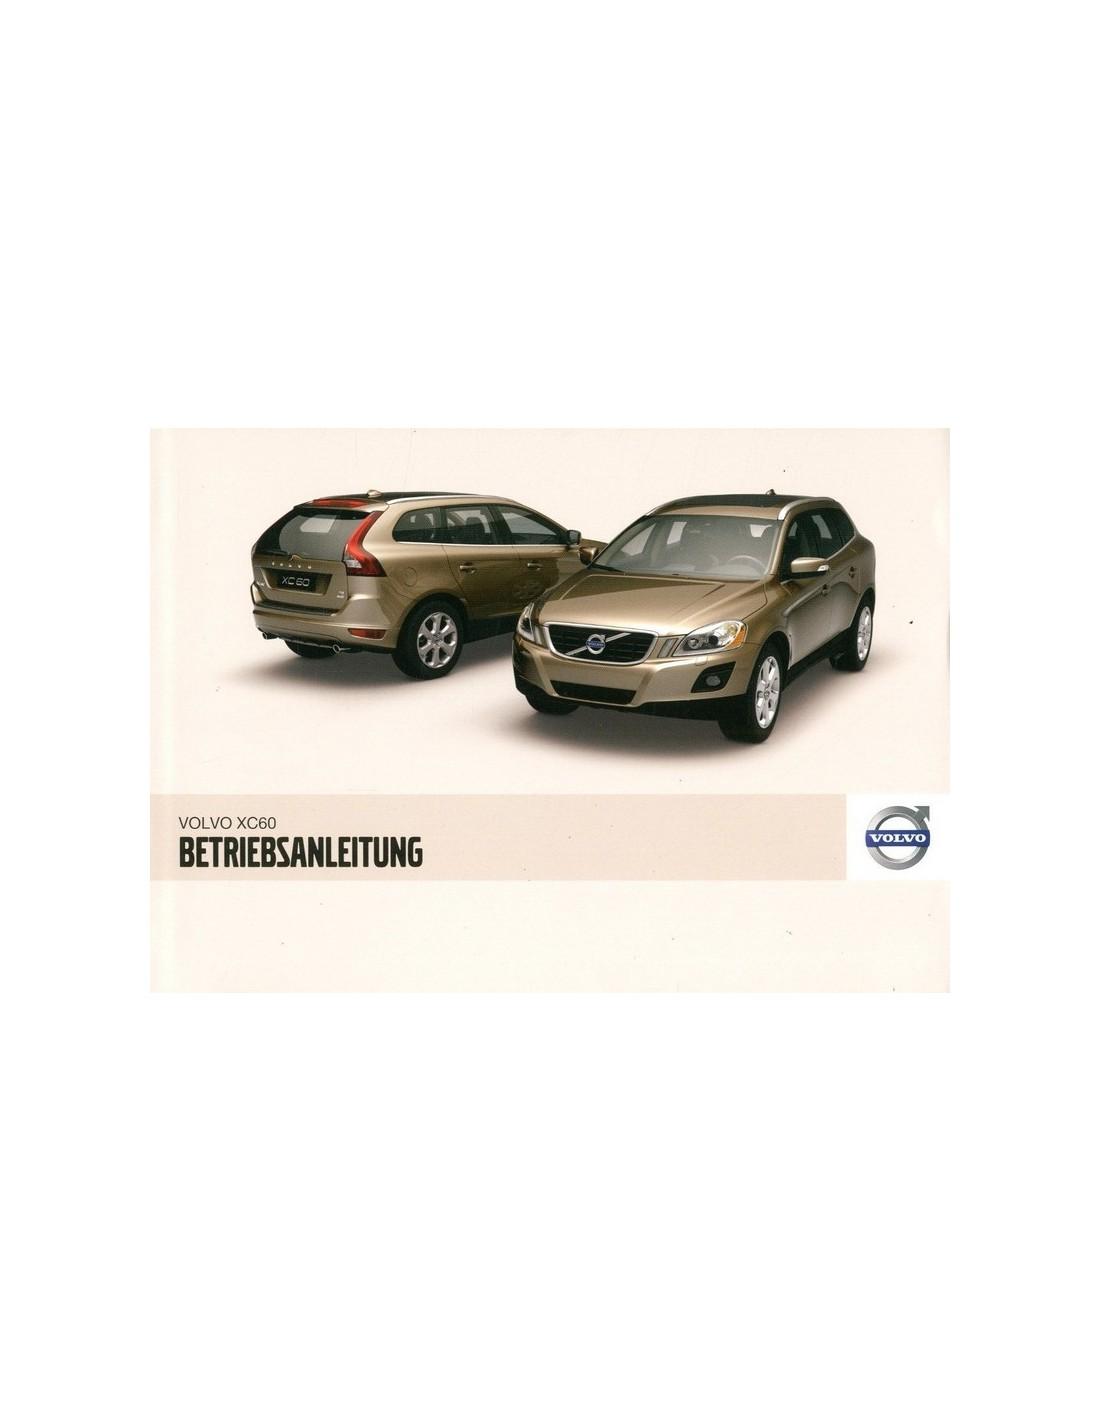 2010 volvo xc60 owner s manual german rh autolit eu 2010 volvo xc60 owner's manual 2010 volvo xc60 repair manual